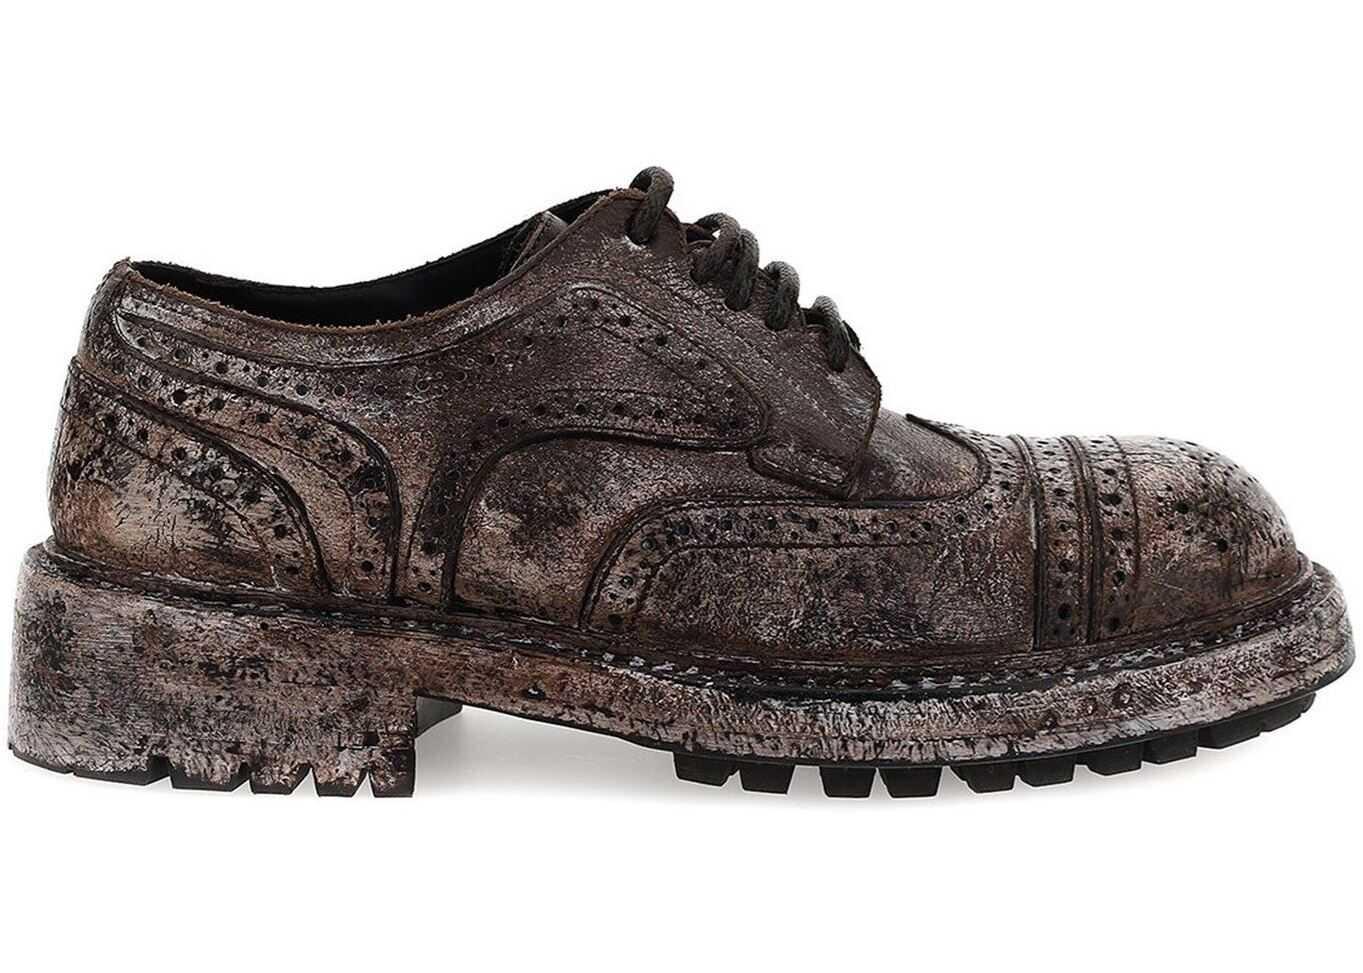 Dolce & Gabbana Bernini Brogues In Brown A10655 AX535 80048 Brown imagine b-mall.ro